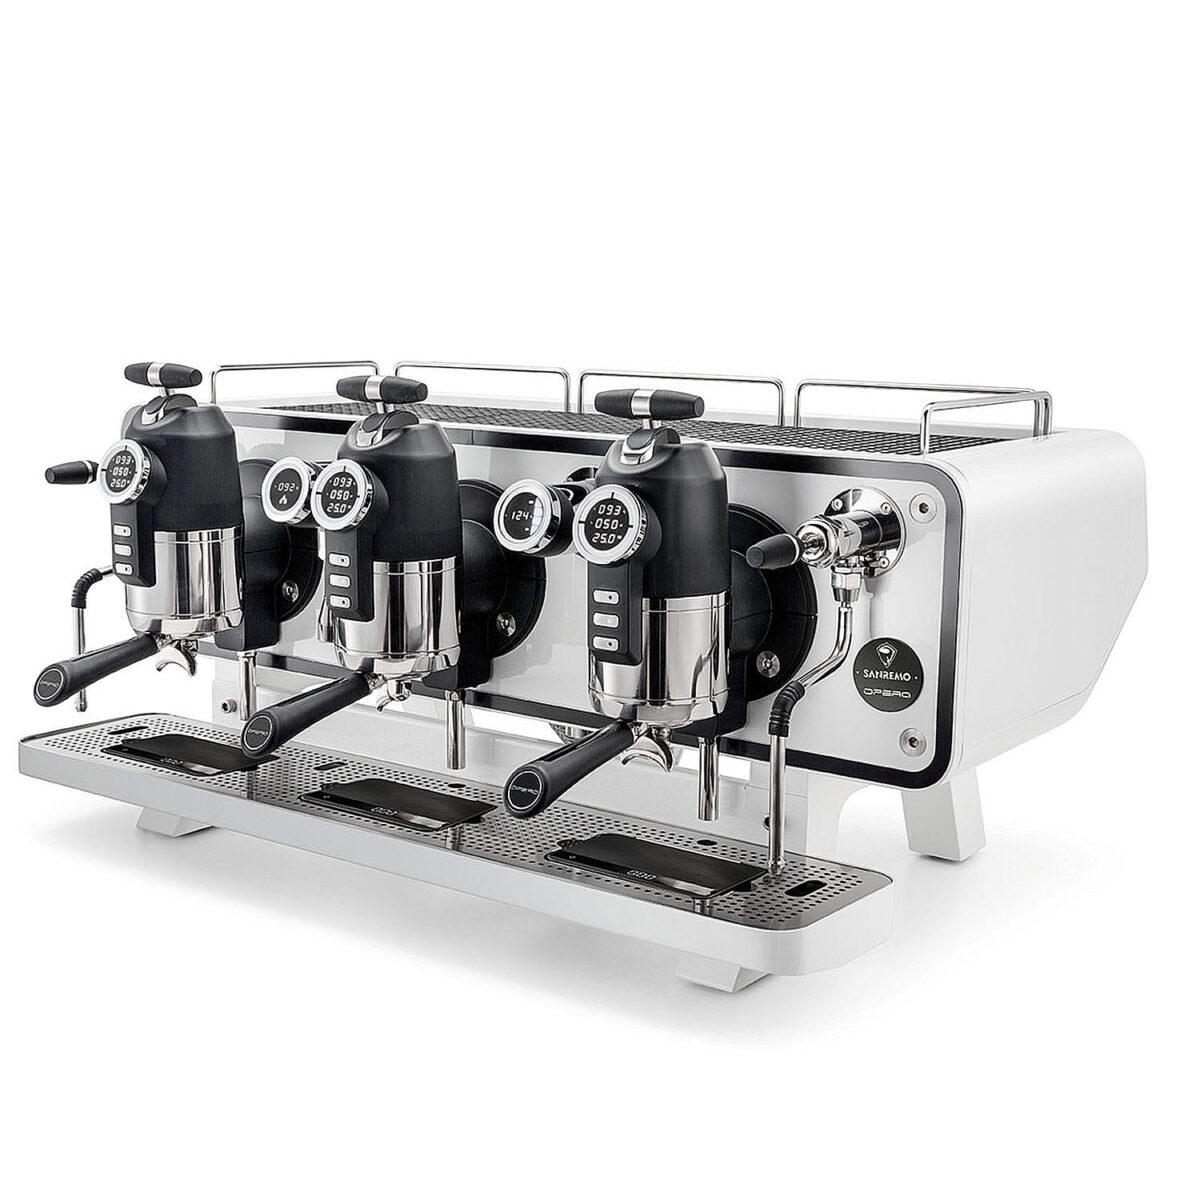 Sanremo Commercial Coffee Machines Opera V2 White